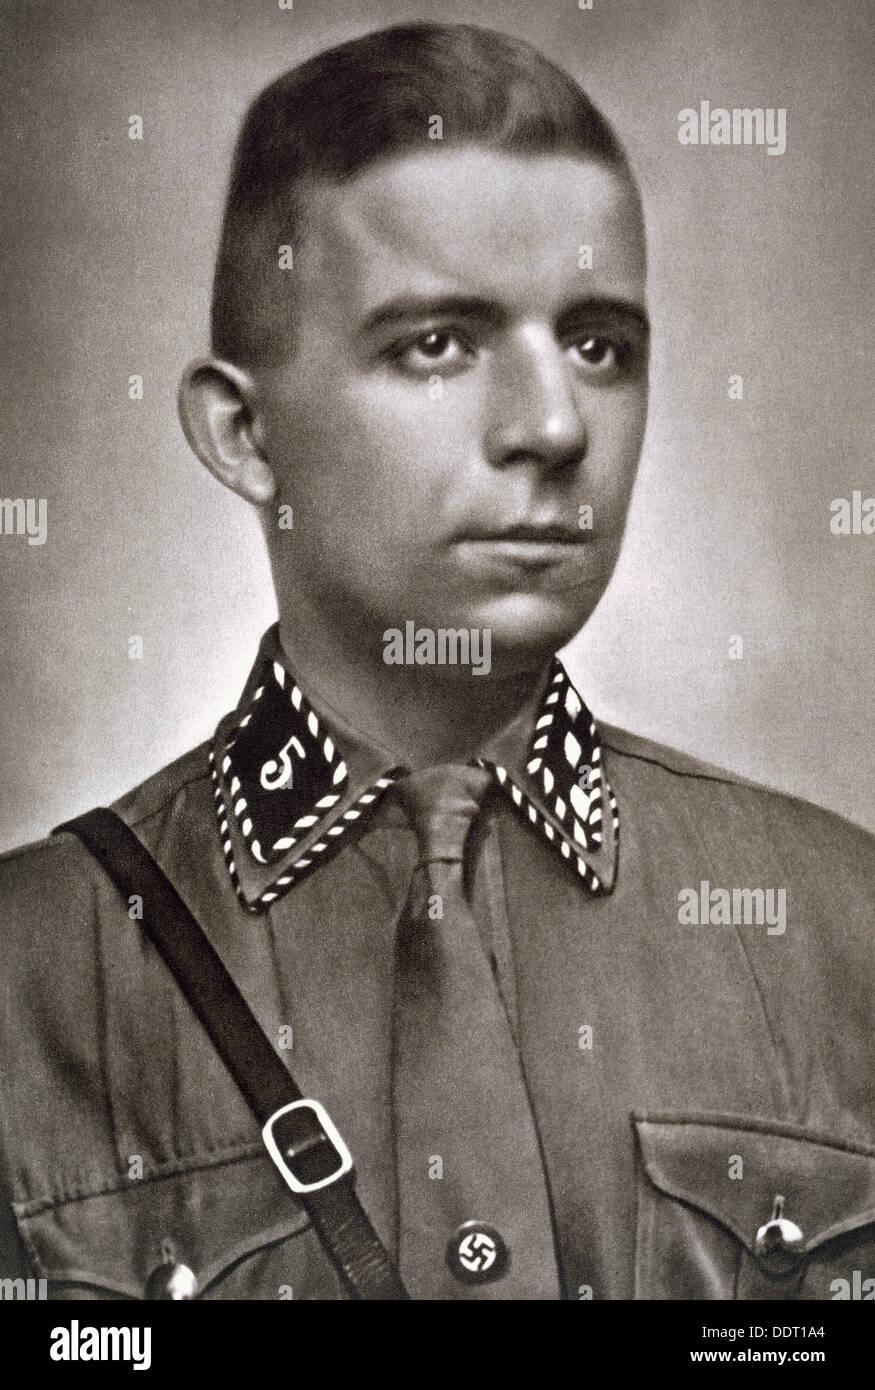 Horst Wessel Stockfotos & Horst Wessel Bilder - Alamy